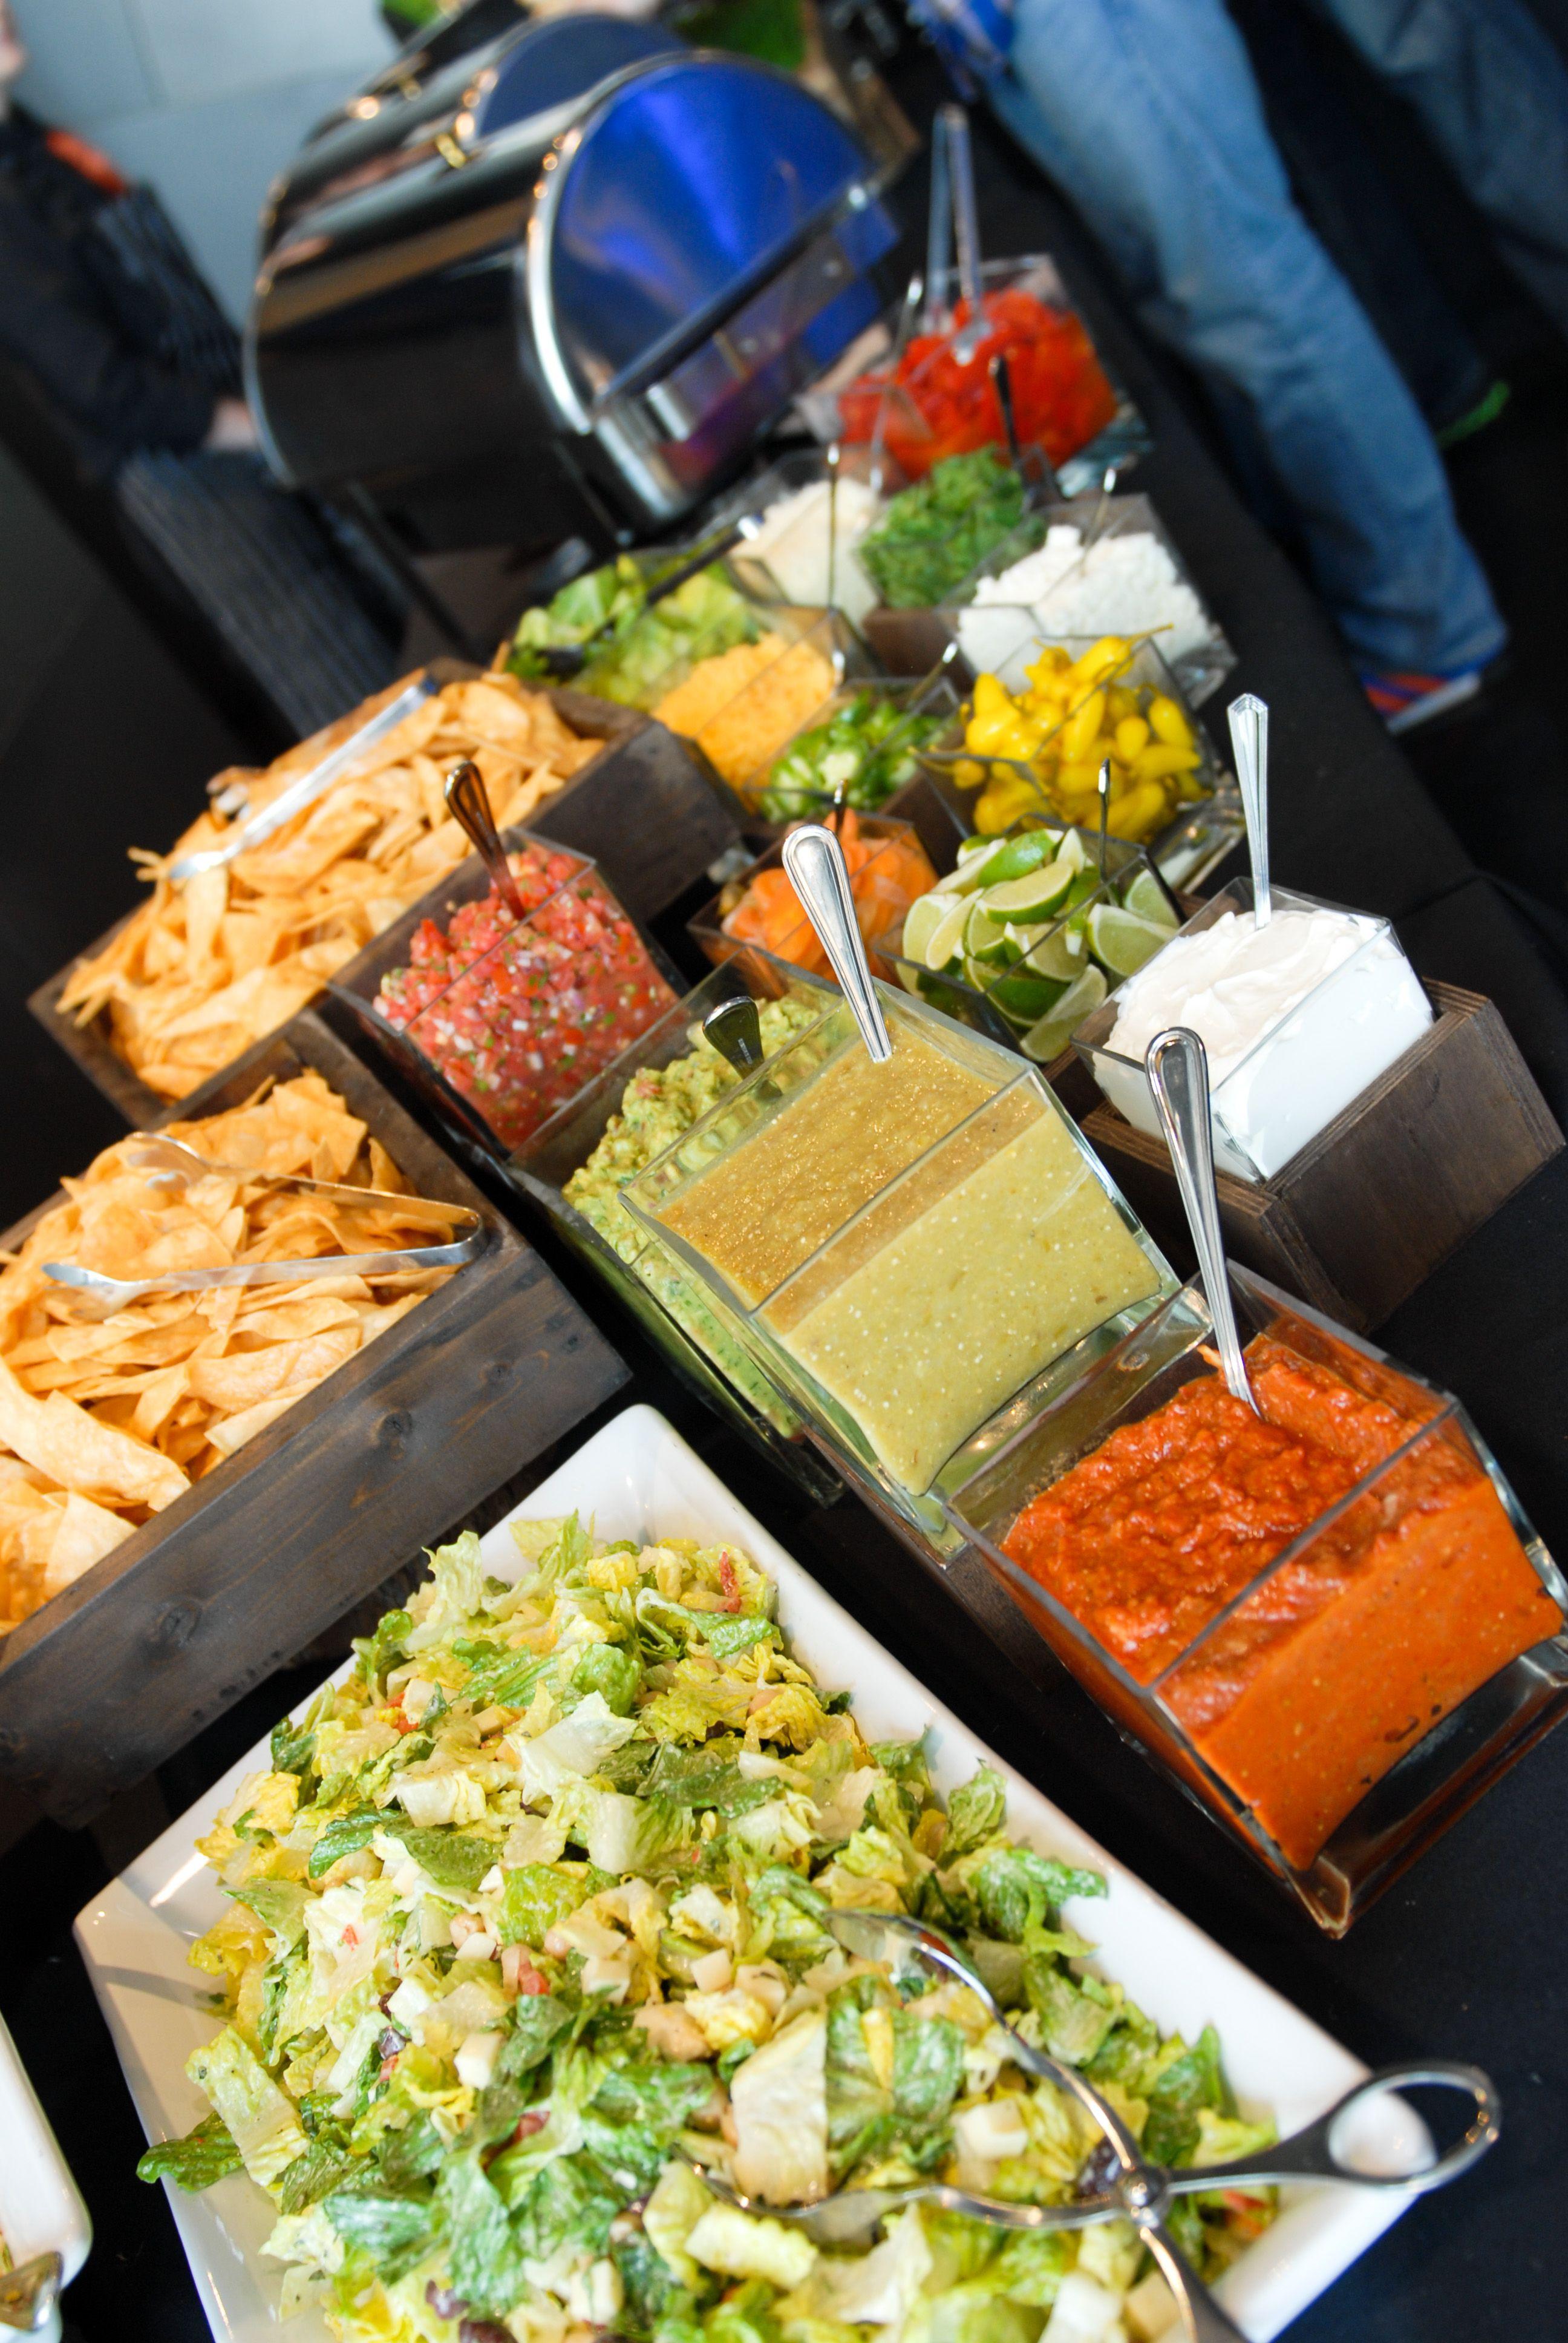 Taco Bar Event Catering Taco Bar Premium Food